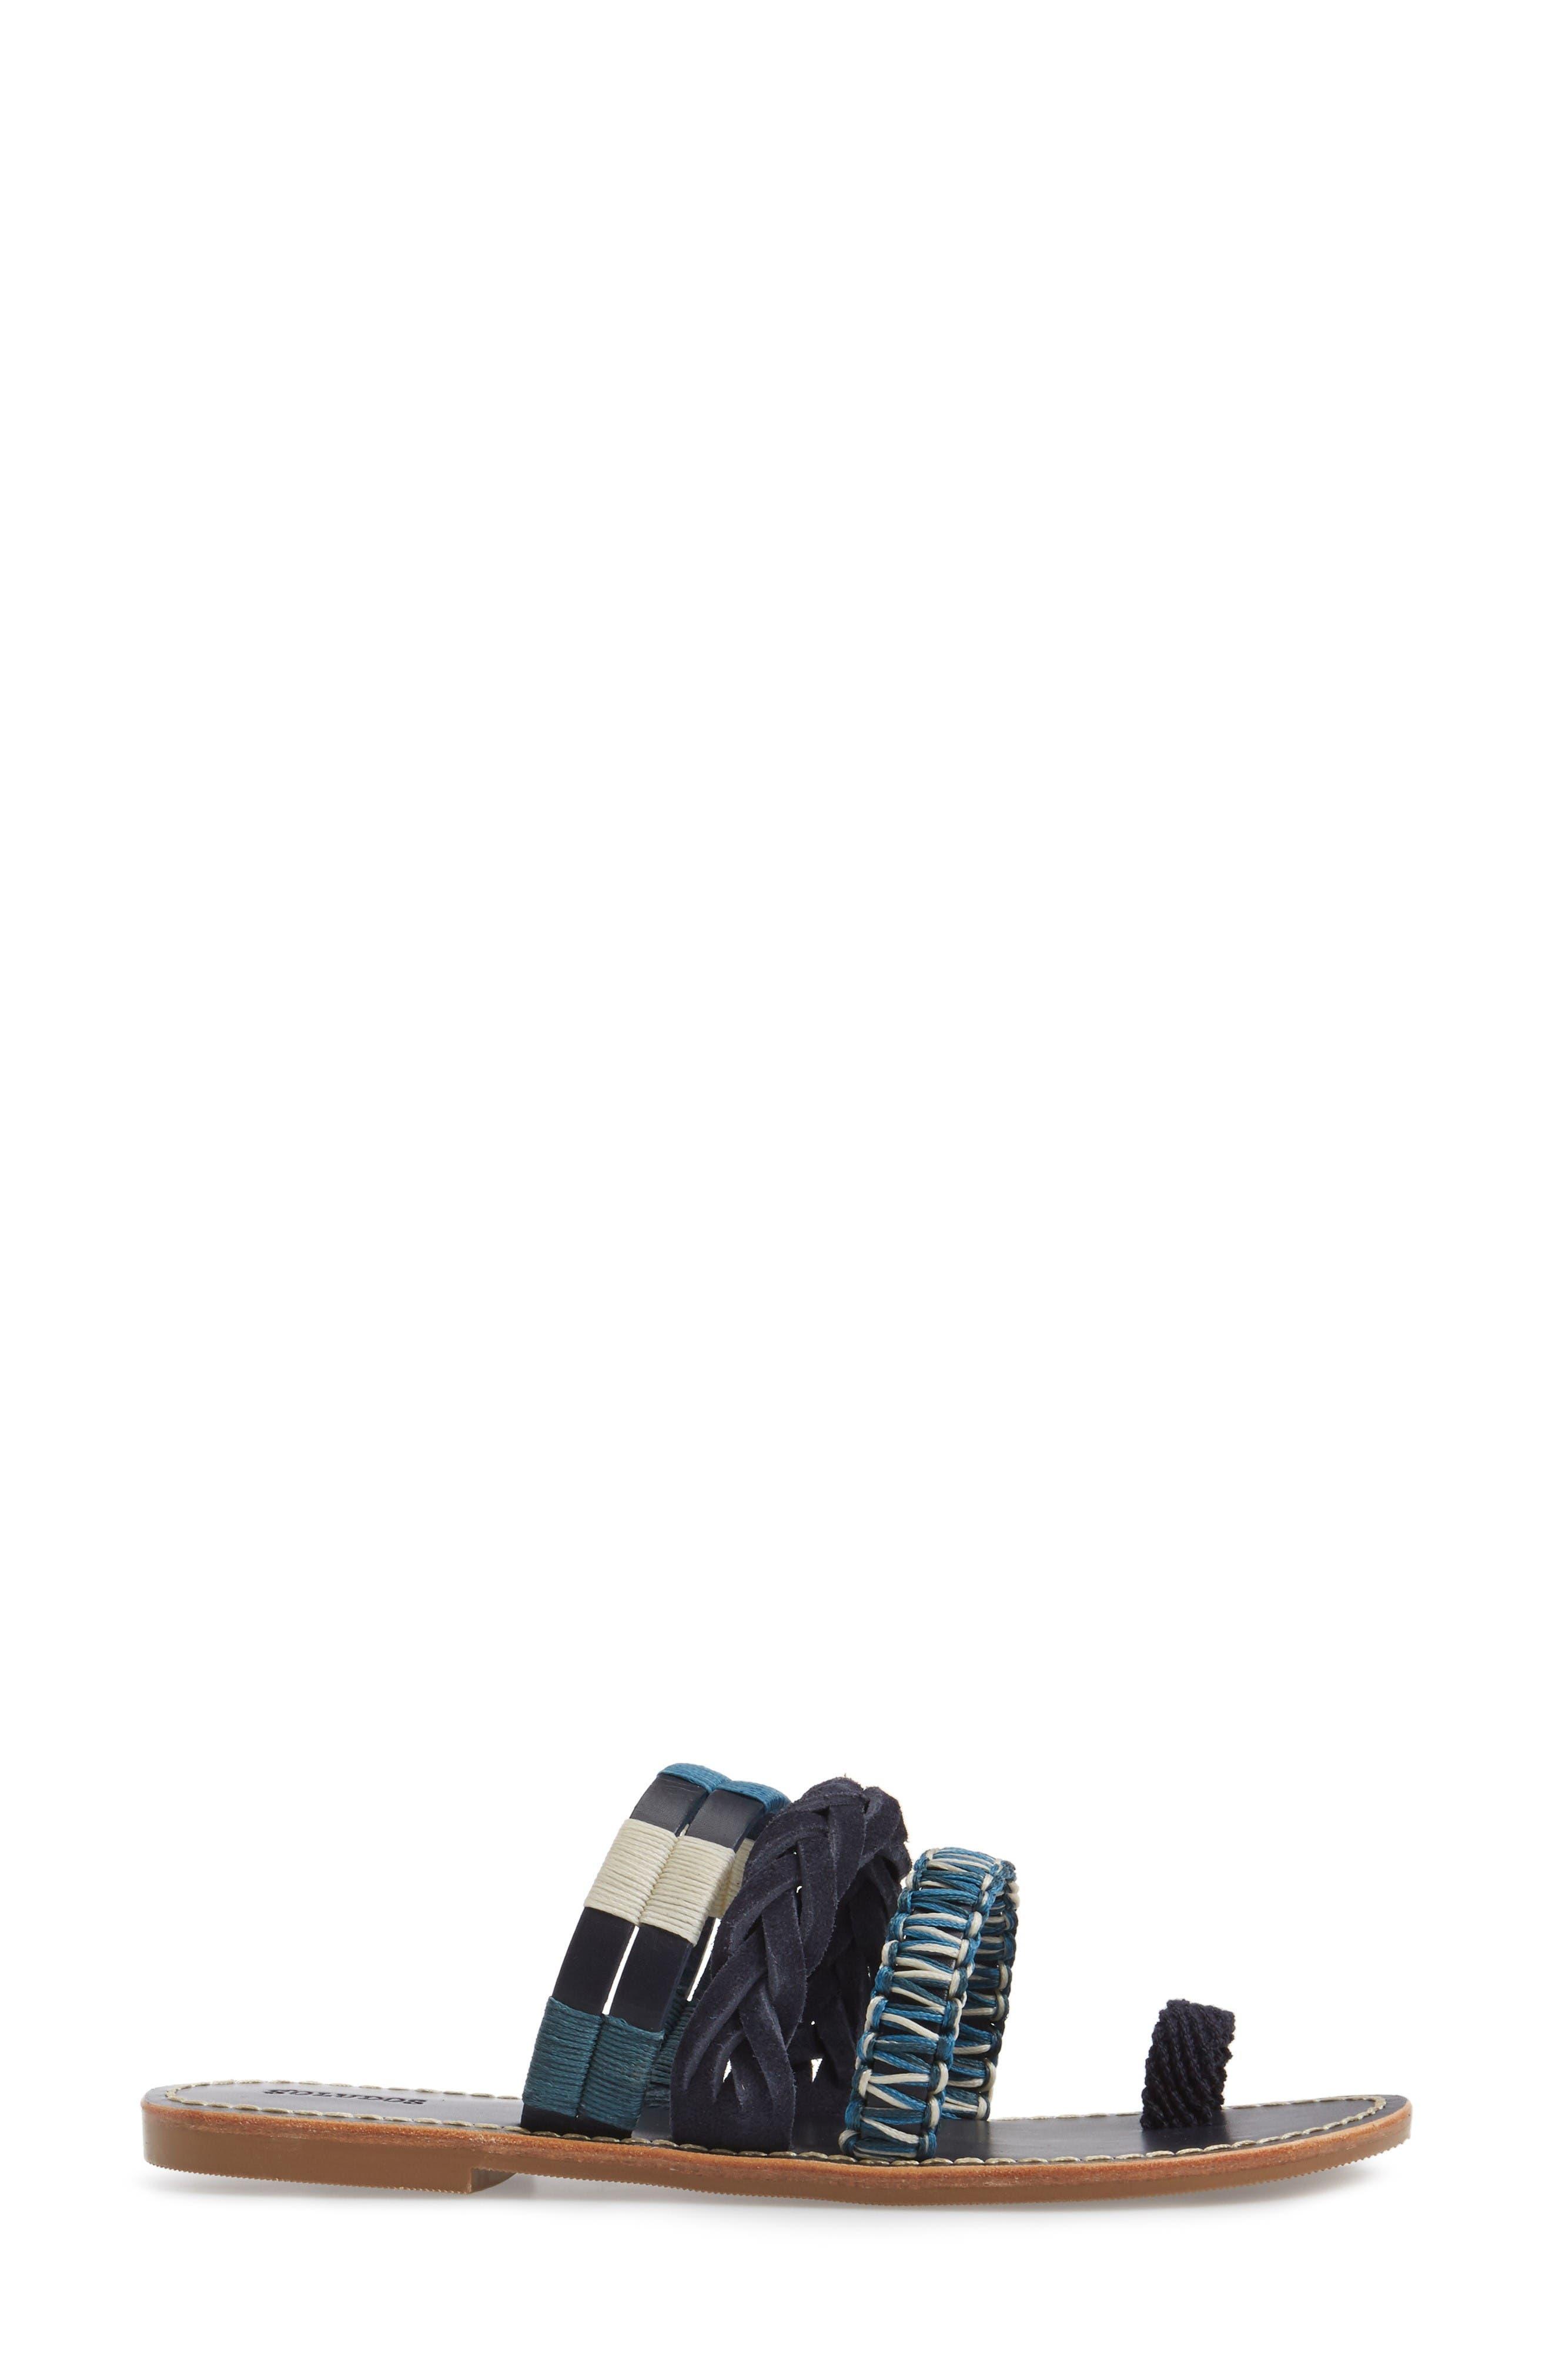 Slide Sandal,                             Alternate thumbnail 4, color,                             Midnight/ Blue Multi Leather